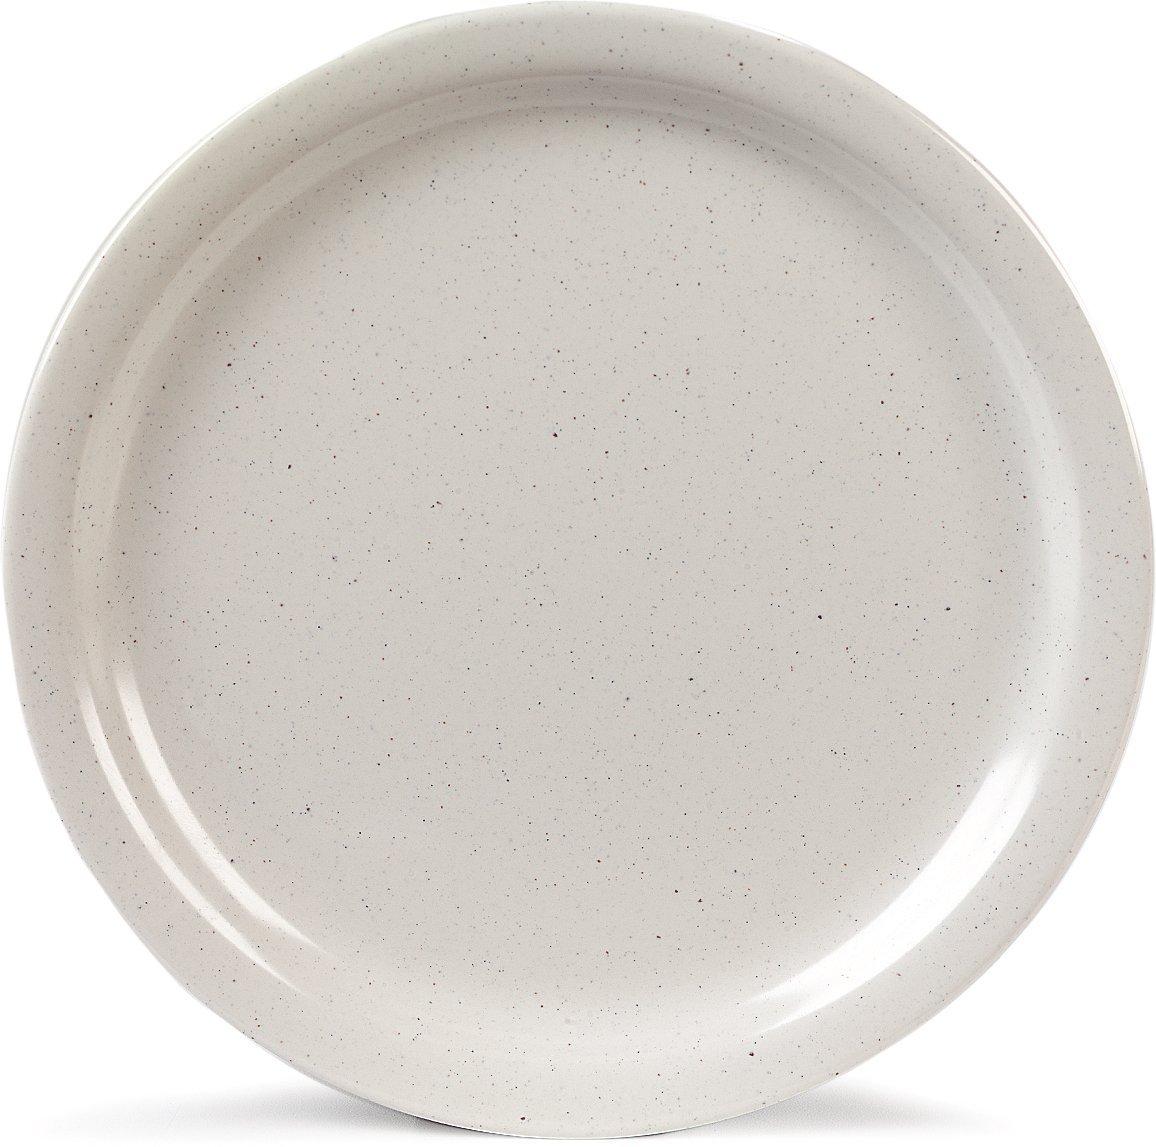 Carlisle KL20070 Kingline Dinner Plates, Set of 48 9-Inch, Melamine, Adobe